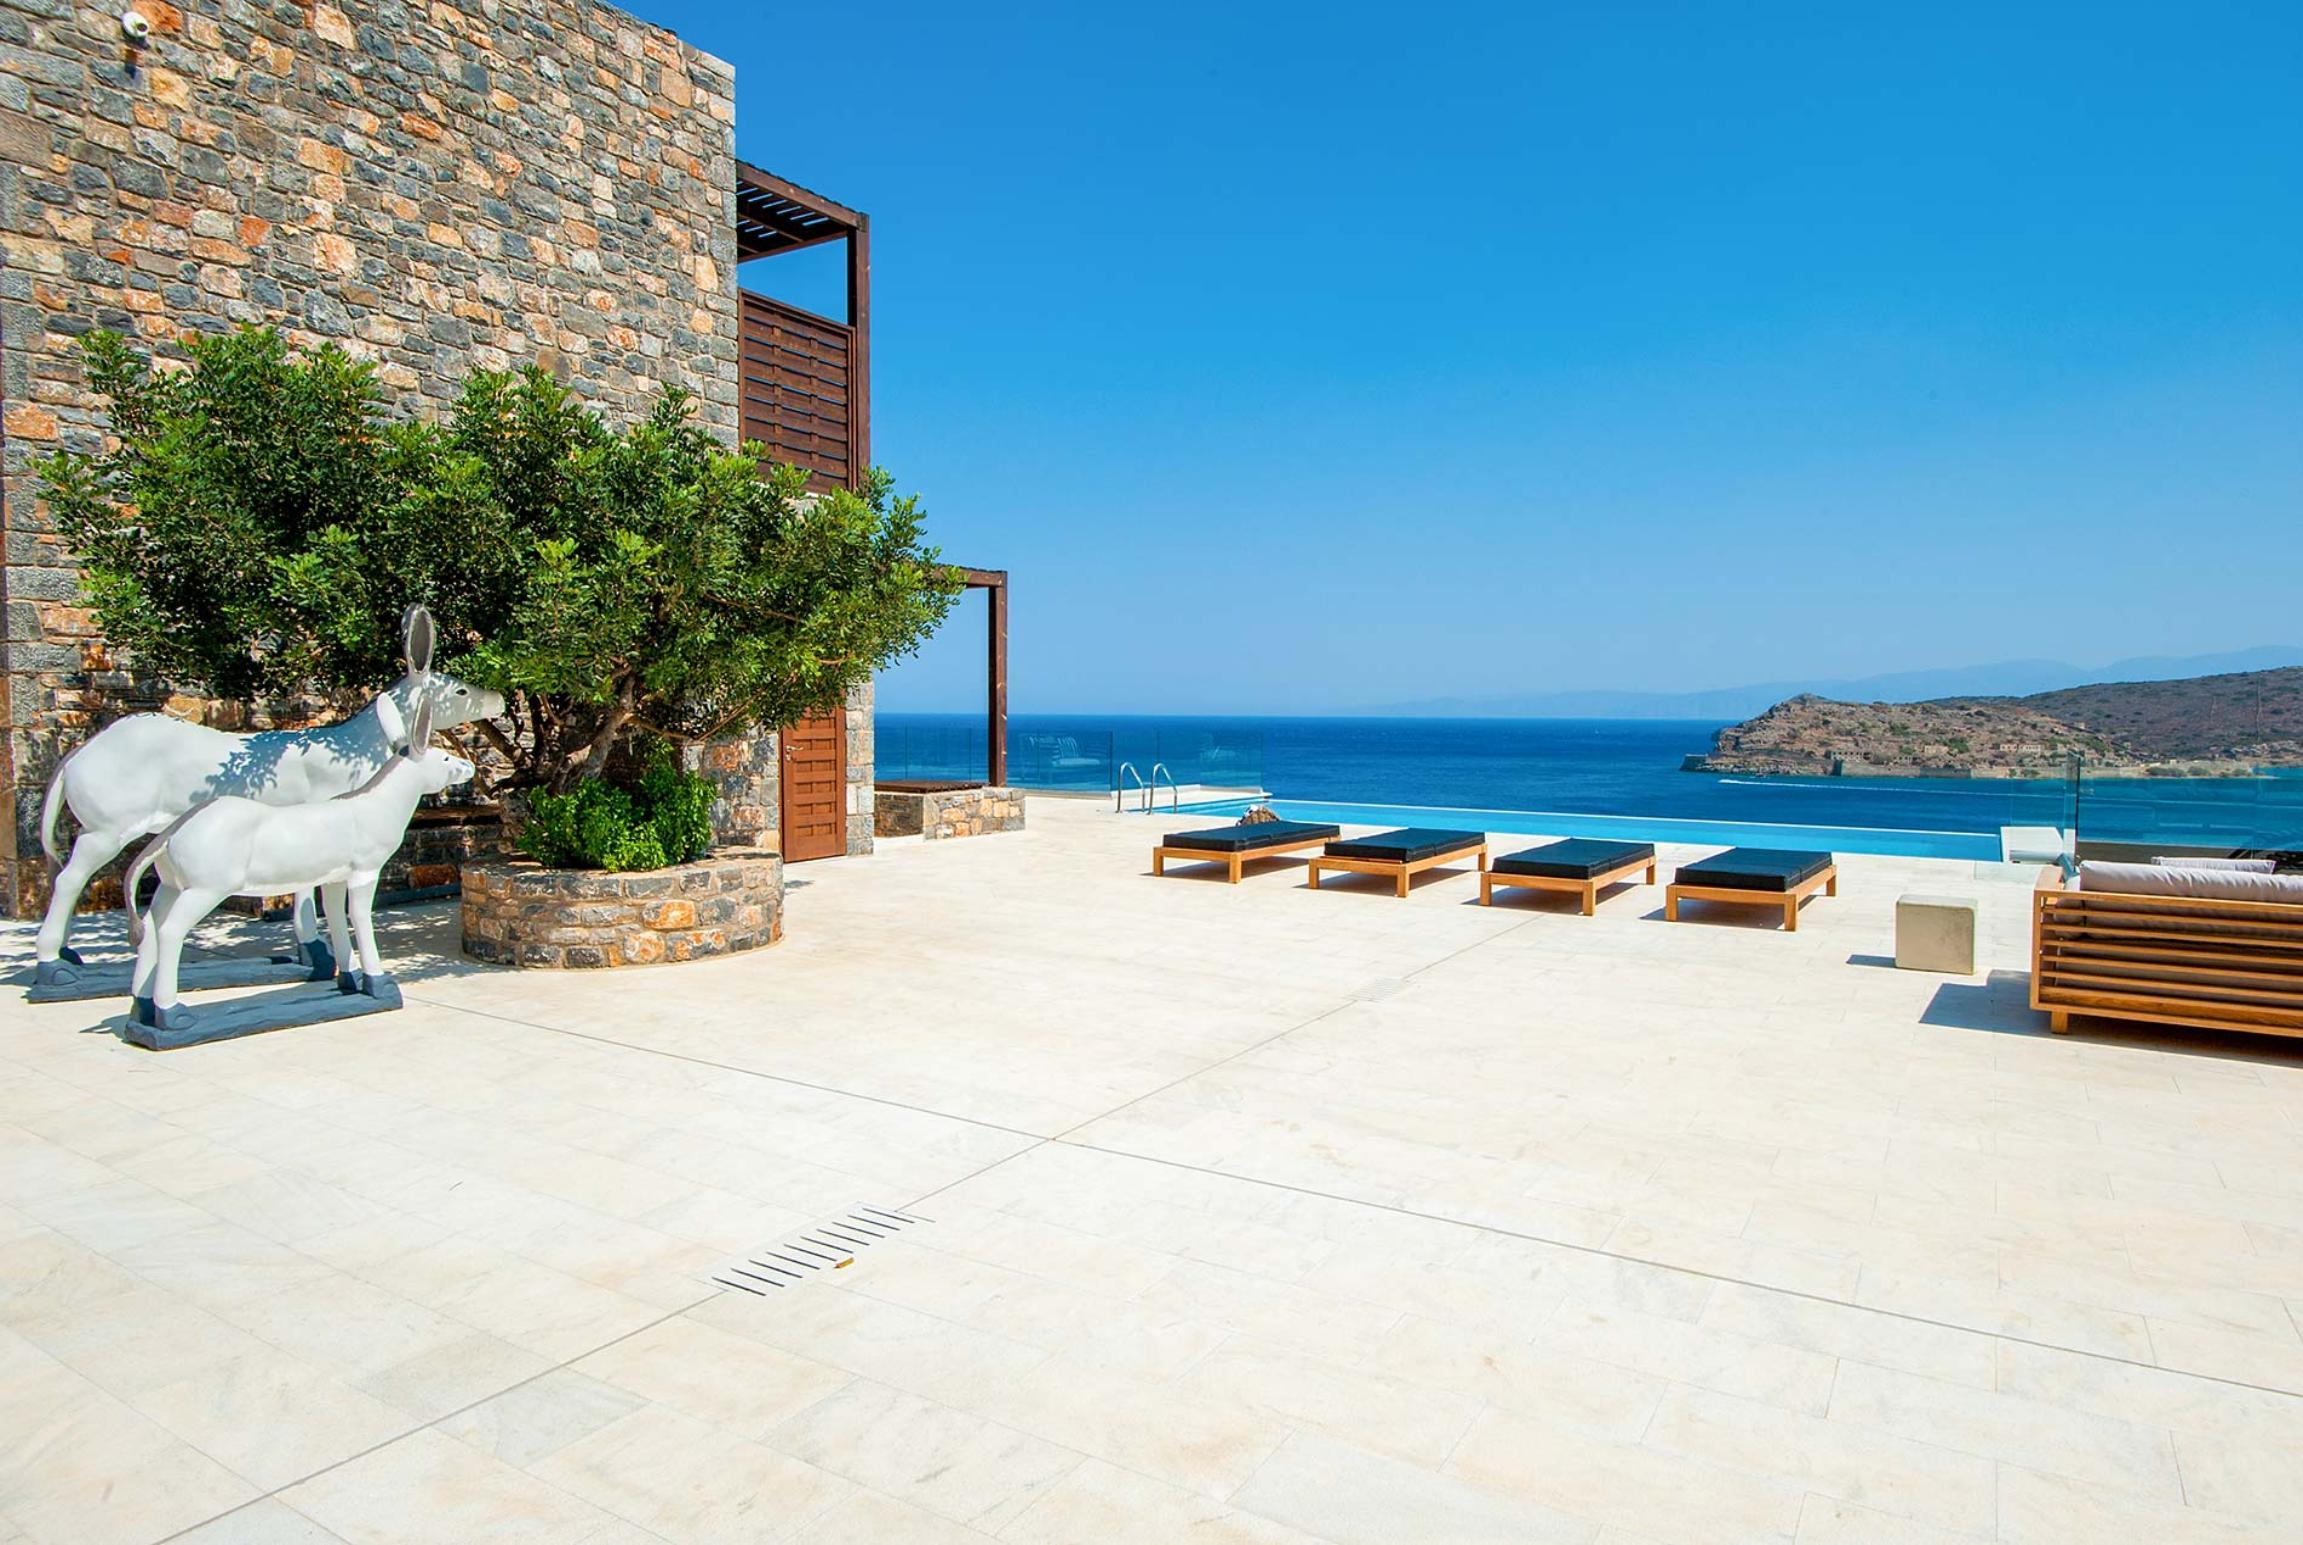 Ferienhaus Dimitra (2654194), Plaka, Kreta Nordküste, Kreta, Griechenland, Bild 30